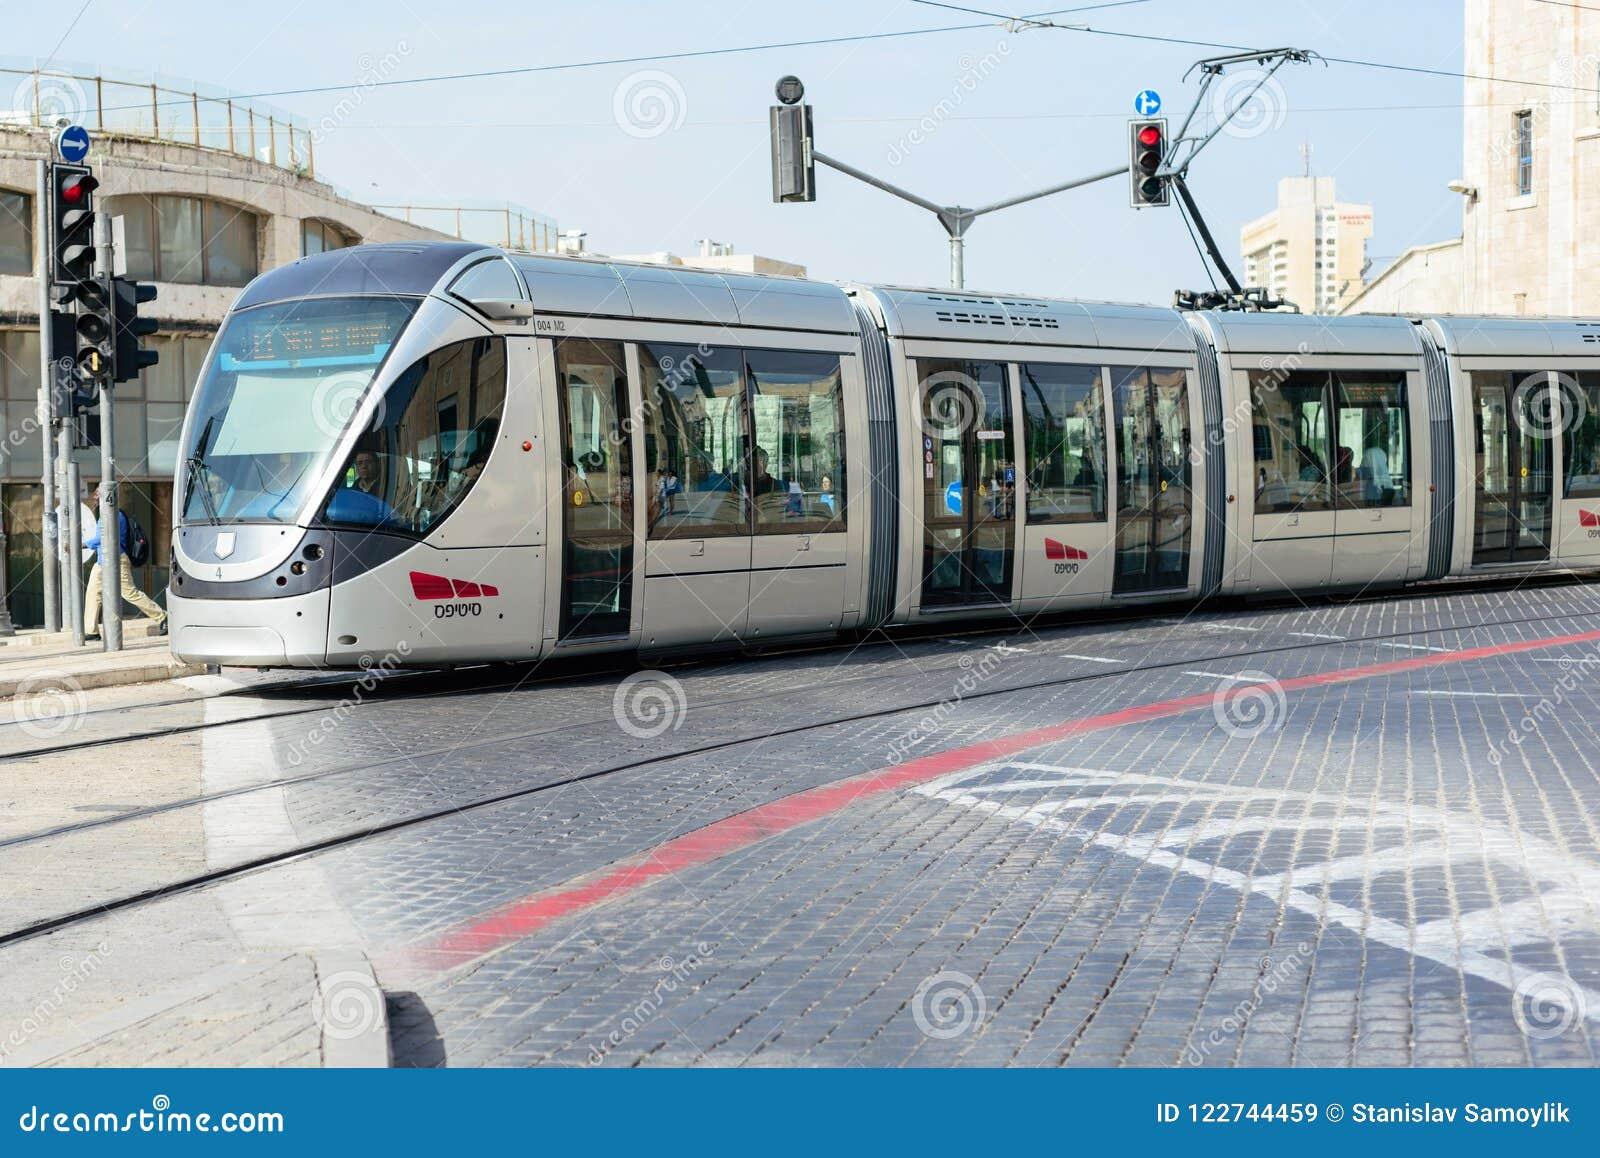 JERUSALEM, ISRAEL - APRIL 2017: The Jerusalem Light Rail is a l